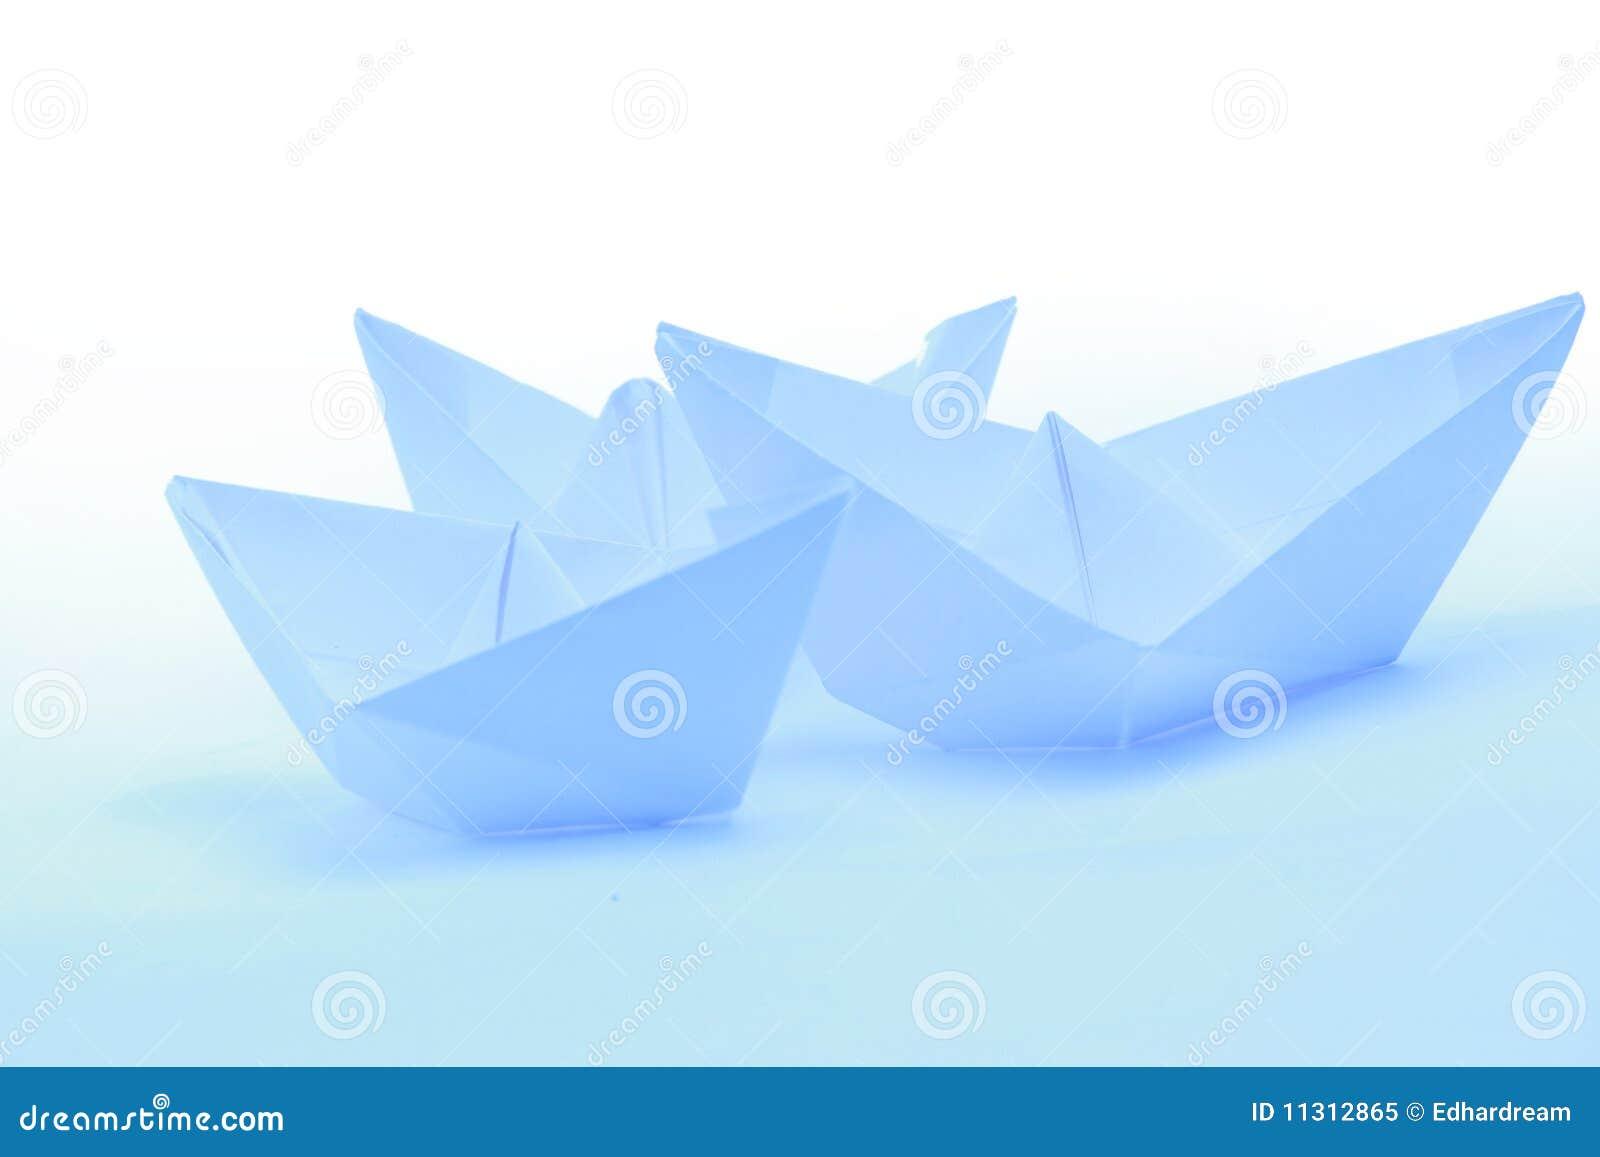 Boote des blauen Papiers